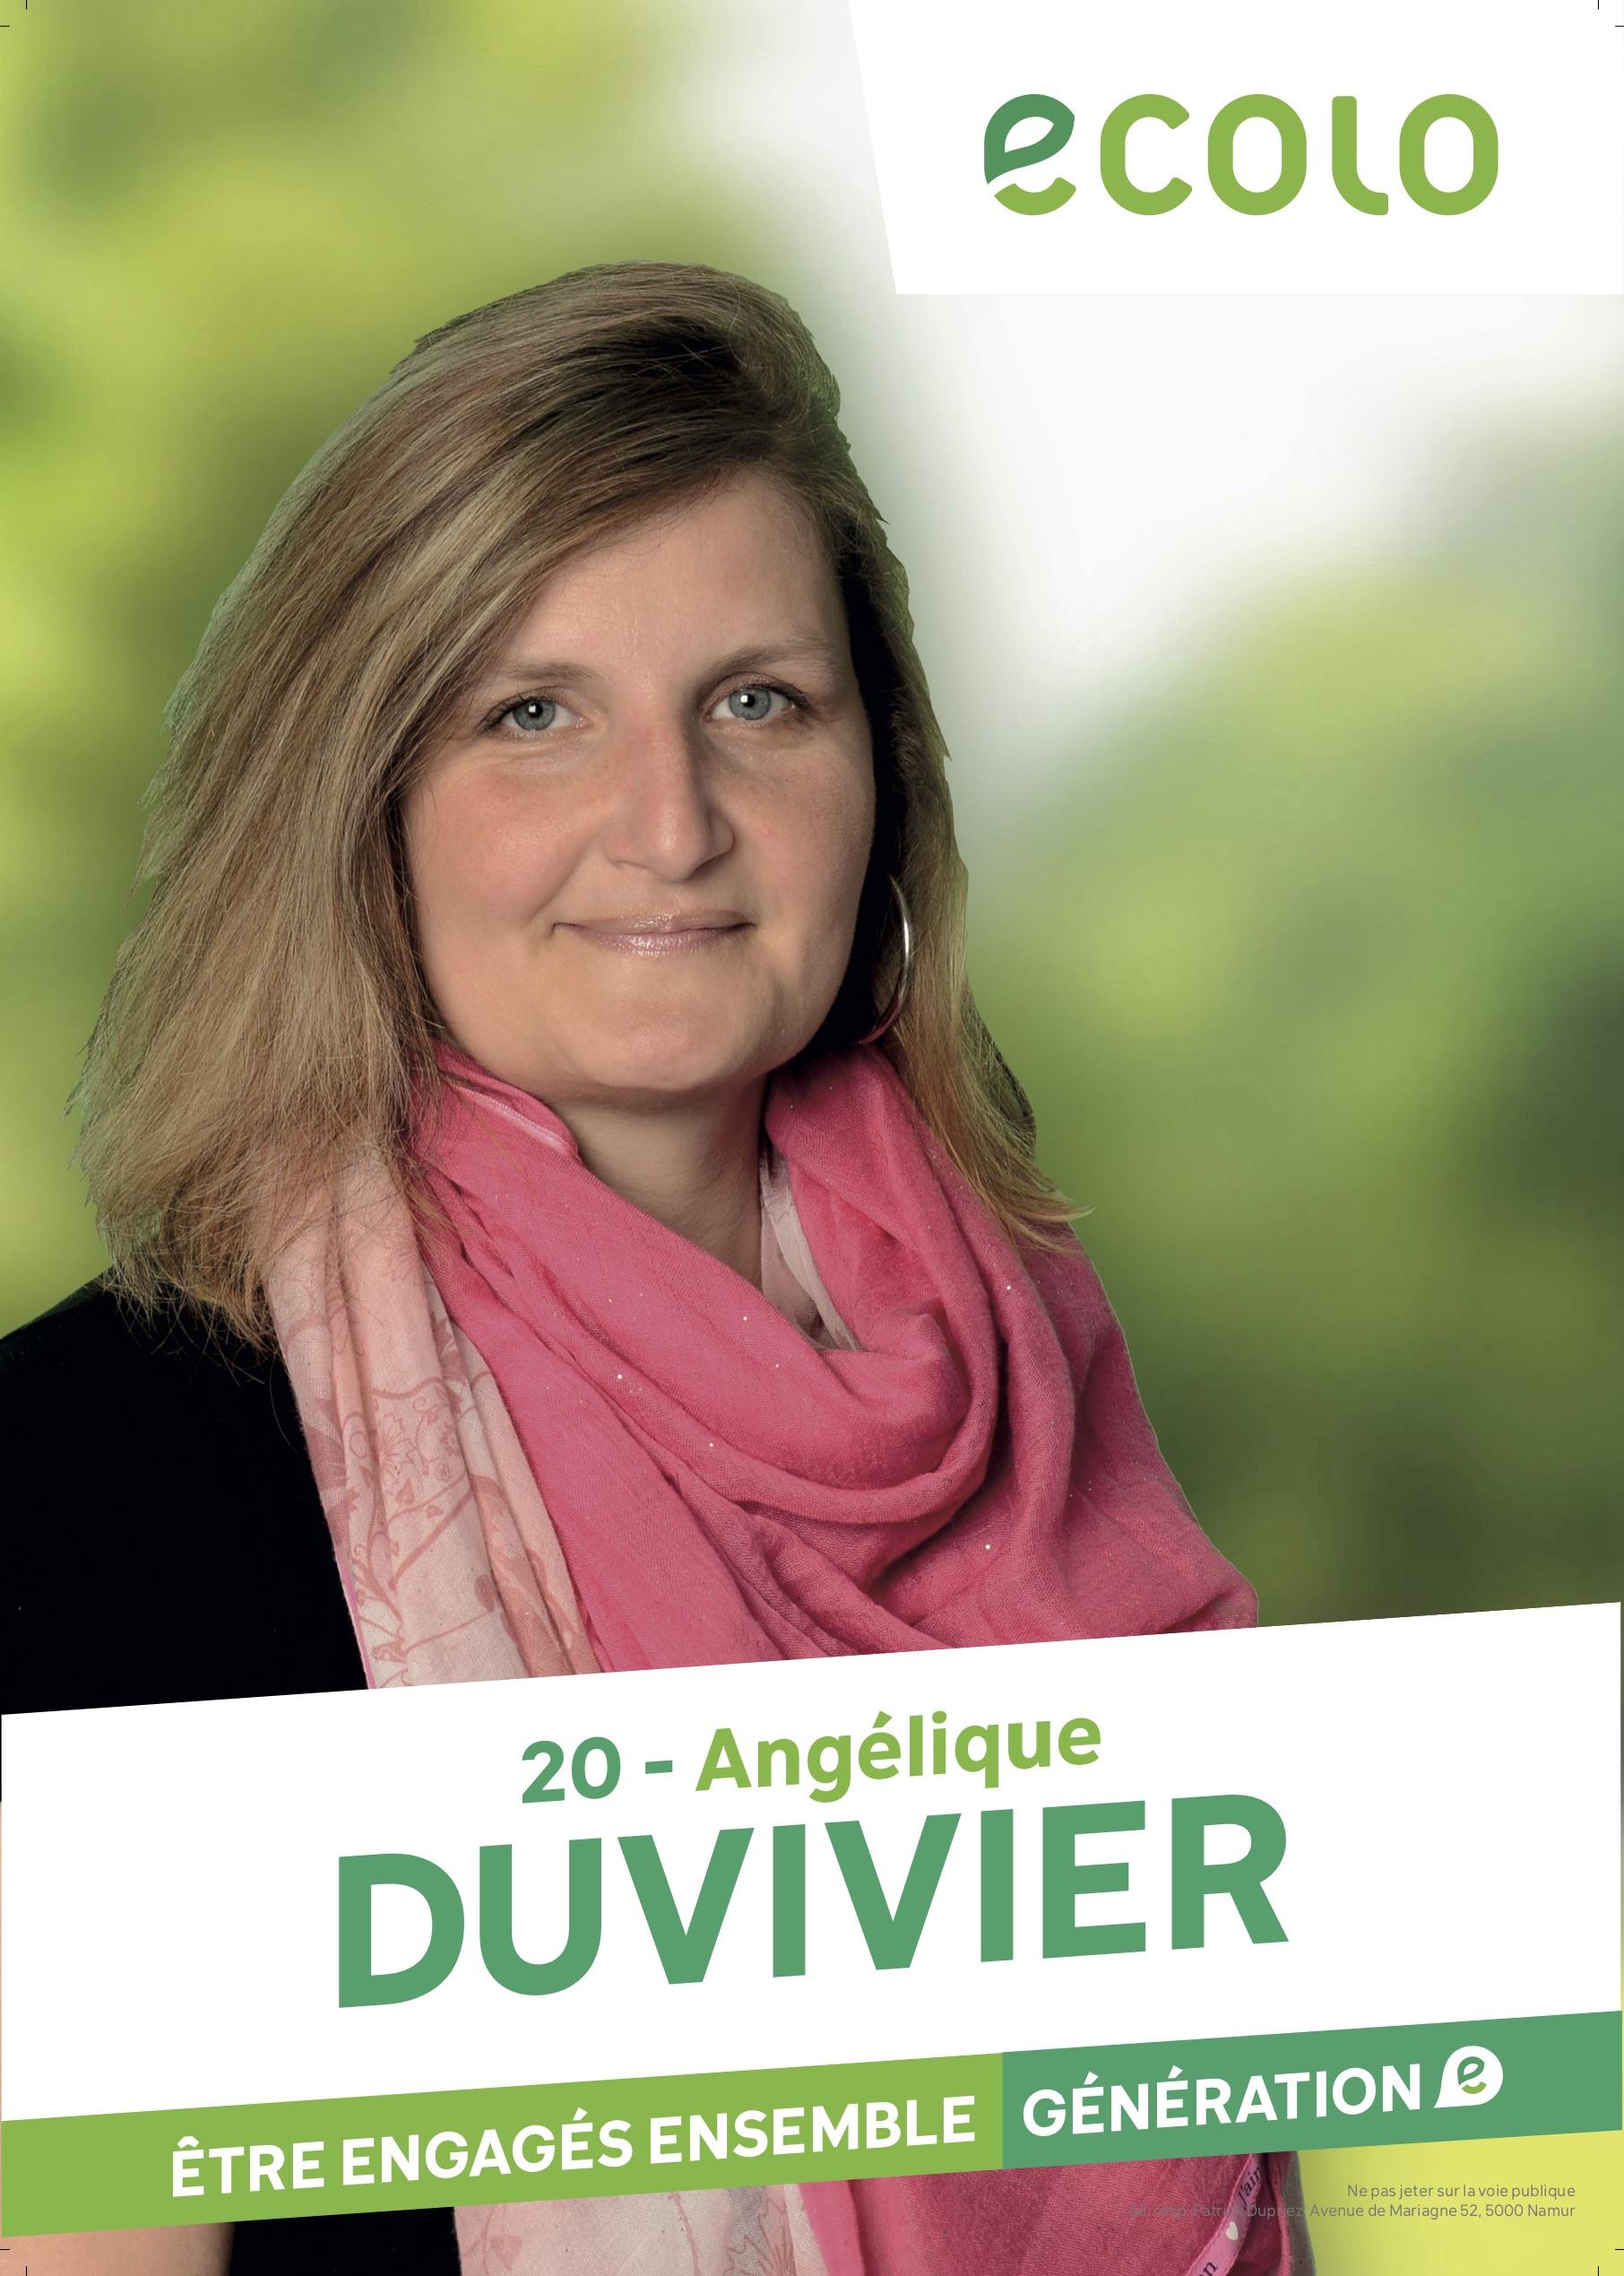 Angélique Duvivier